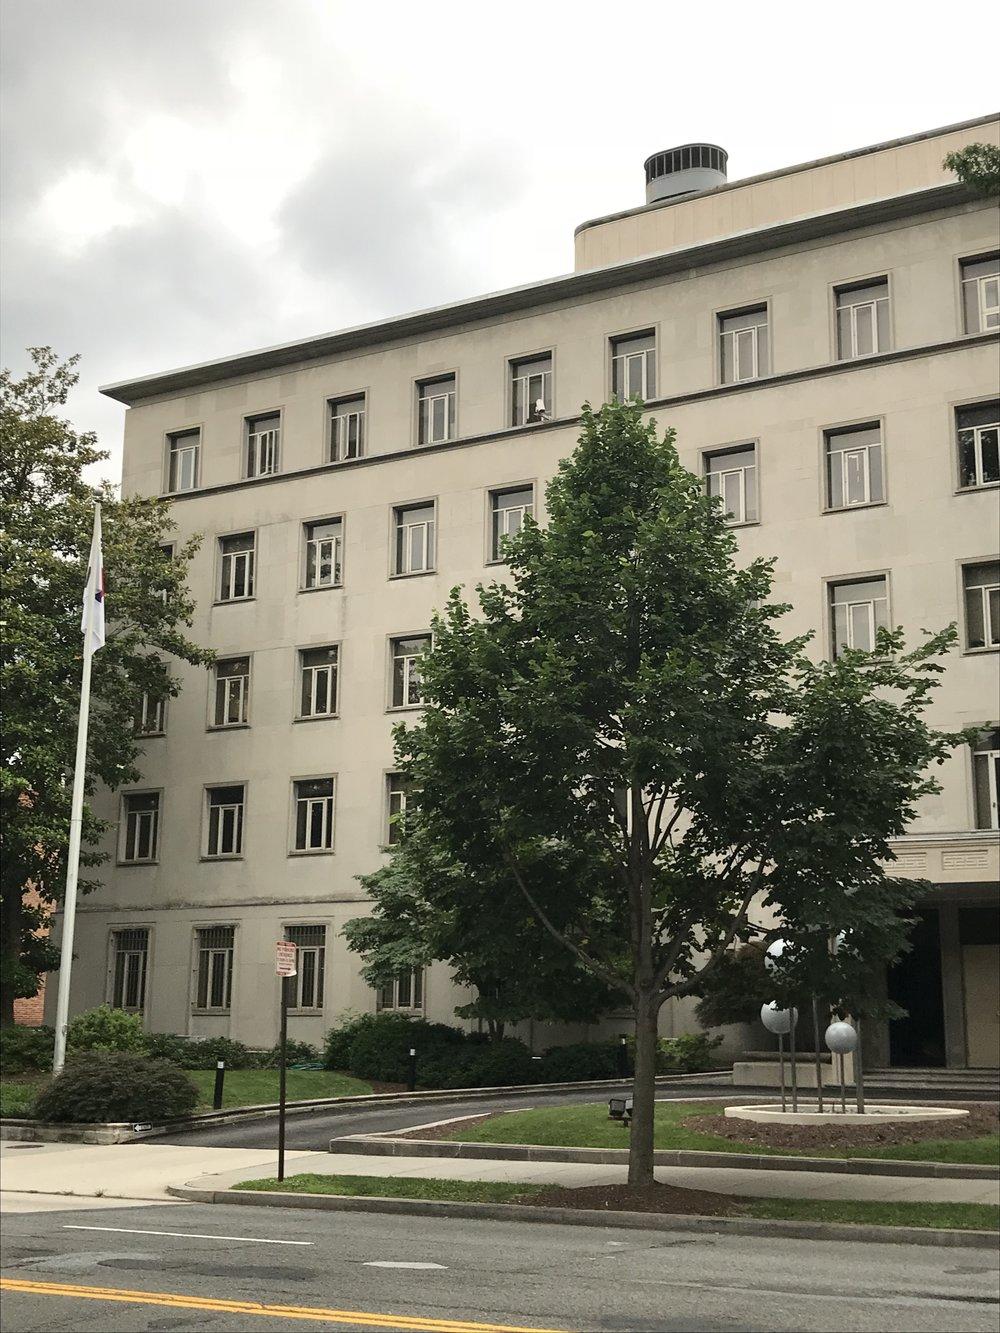 The Embassy of South Korea.